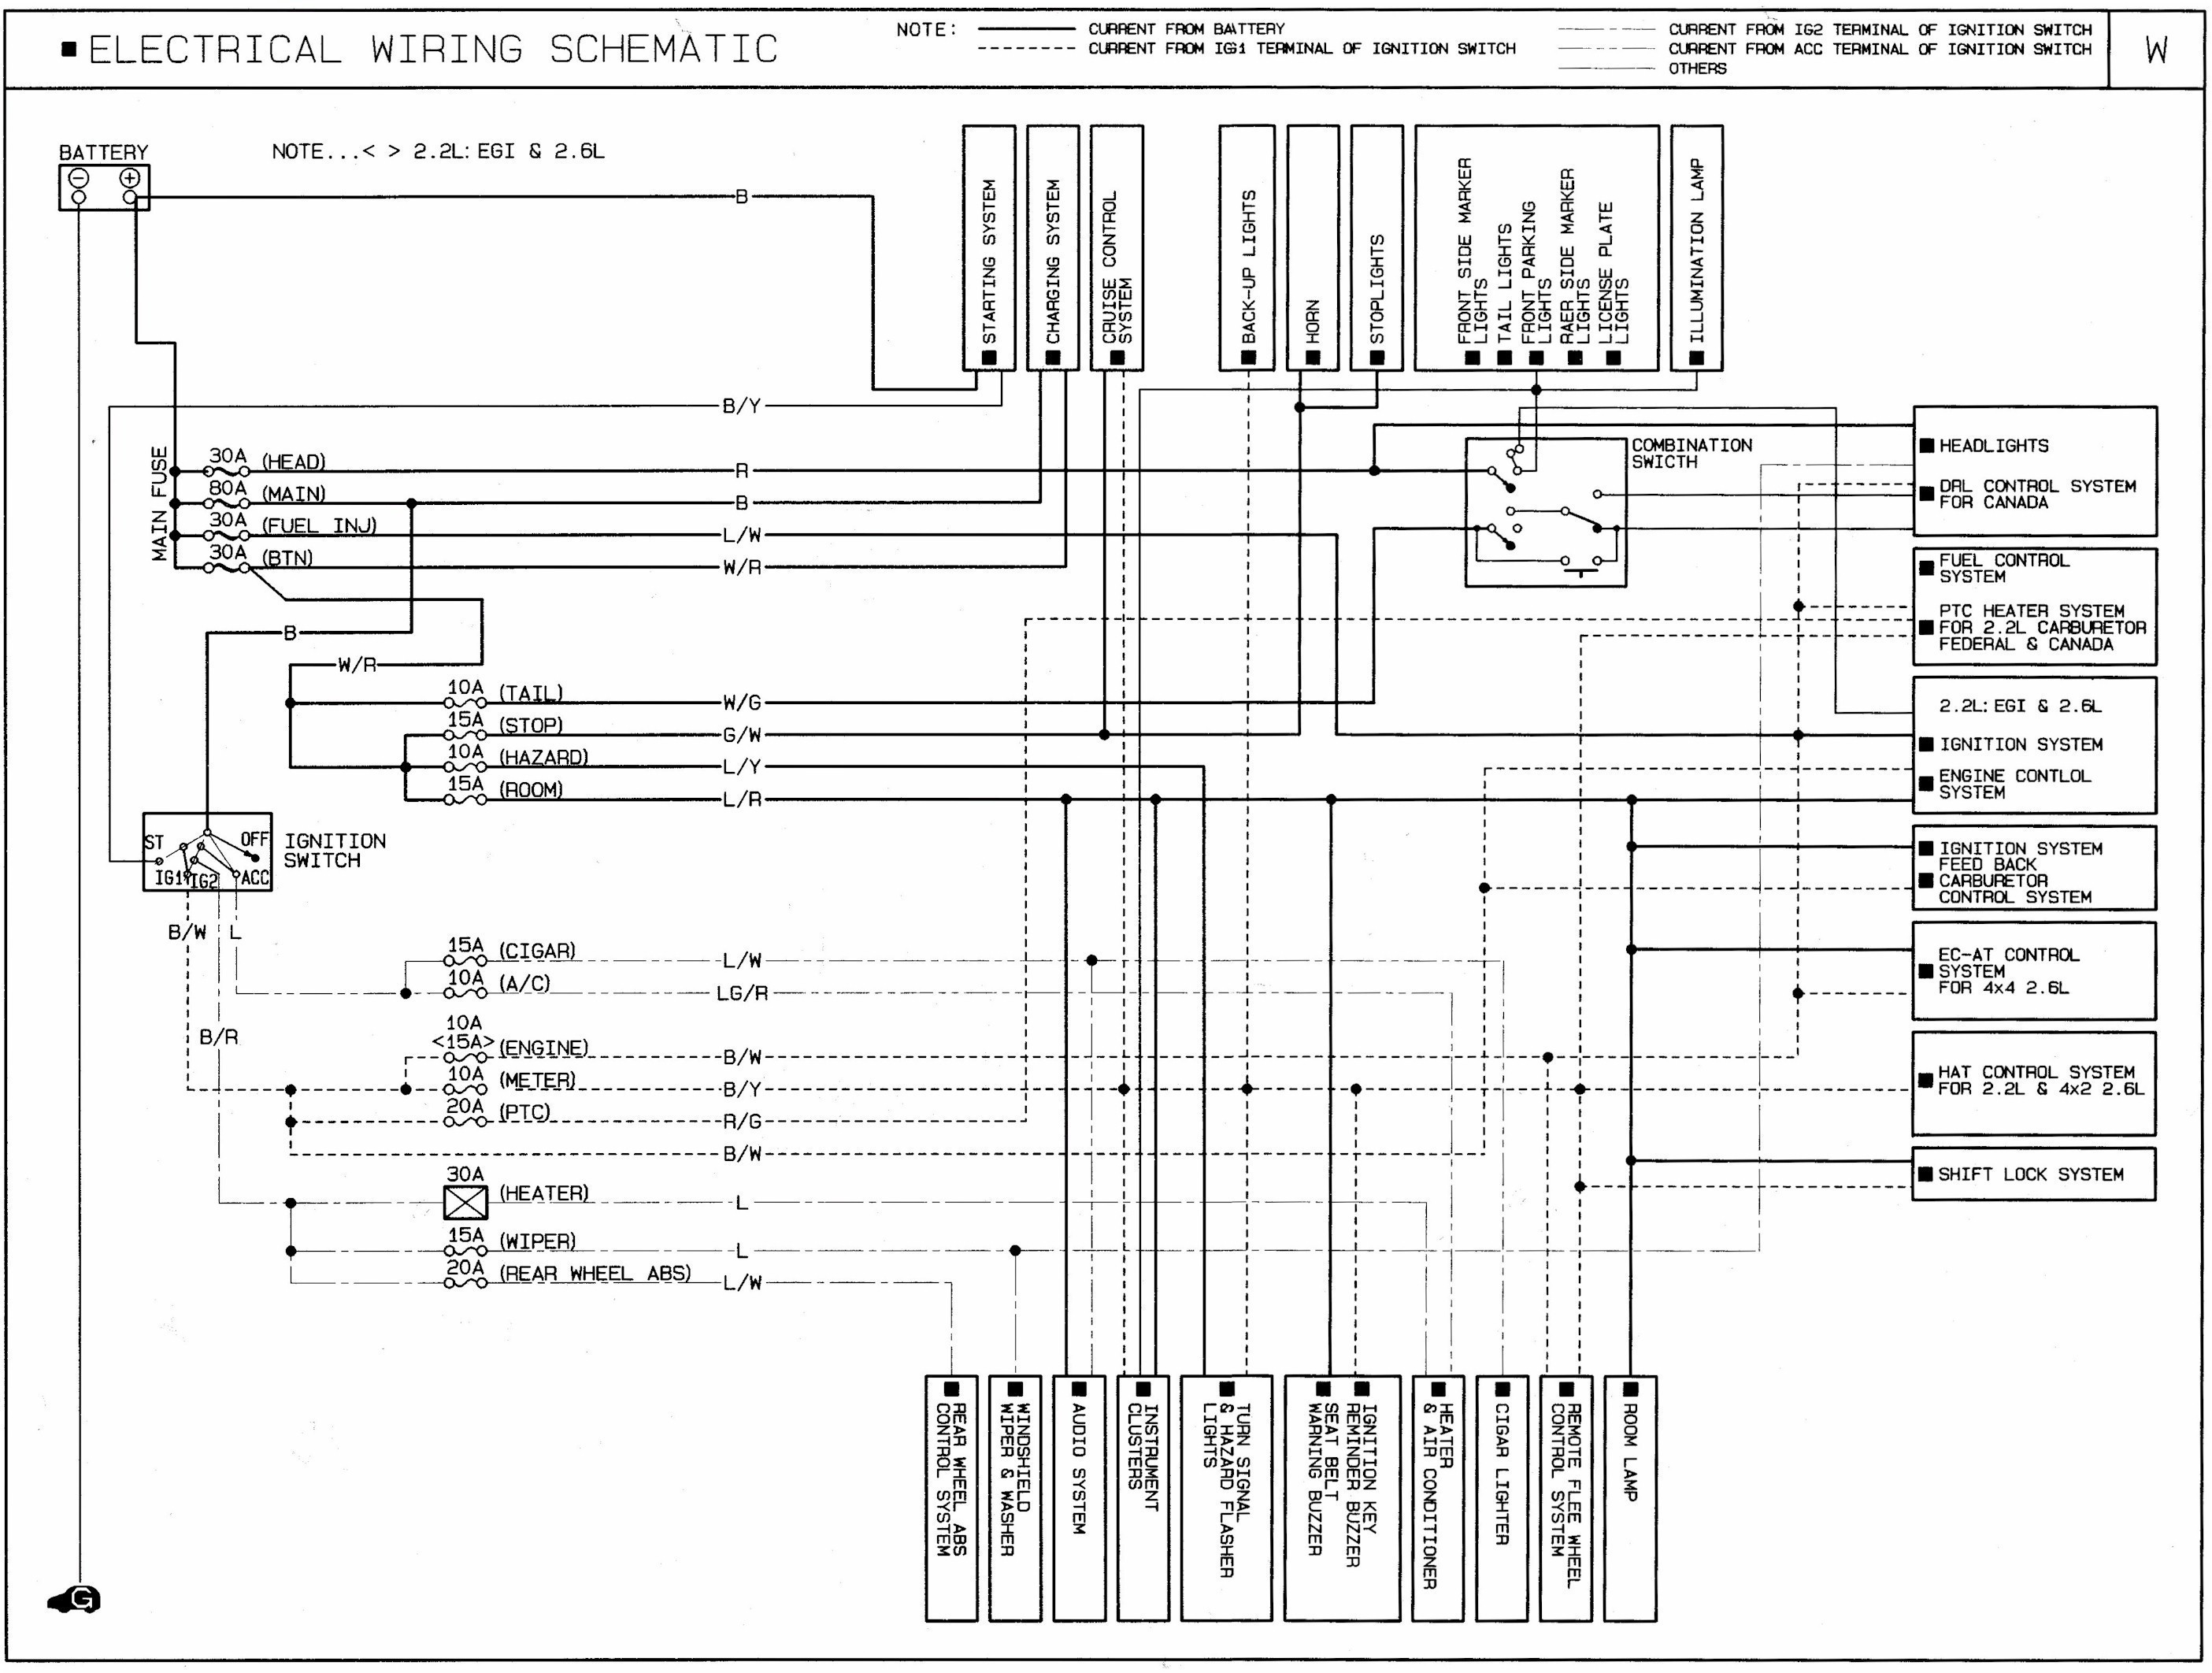 Mazda 323 Engine Diagram Wiper Switch Wiring Diagram 1996 626 Mazda Worksheet and Wiring Of Mazda 323 Engine Diagram